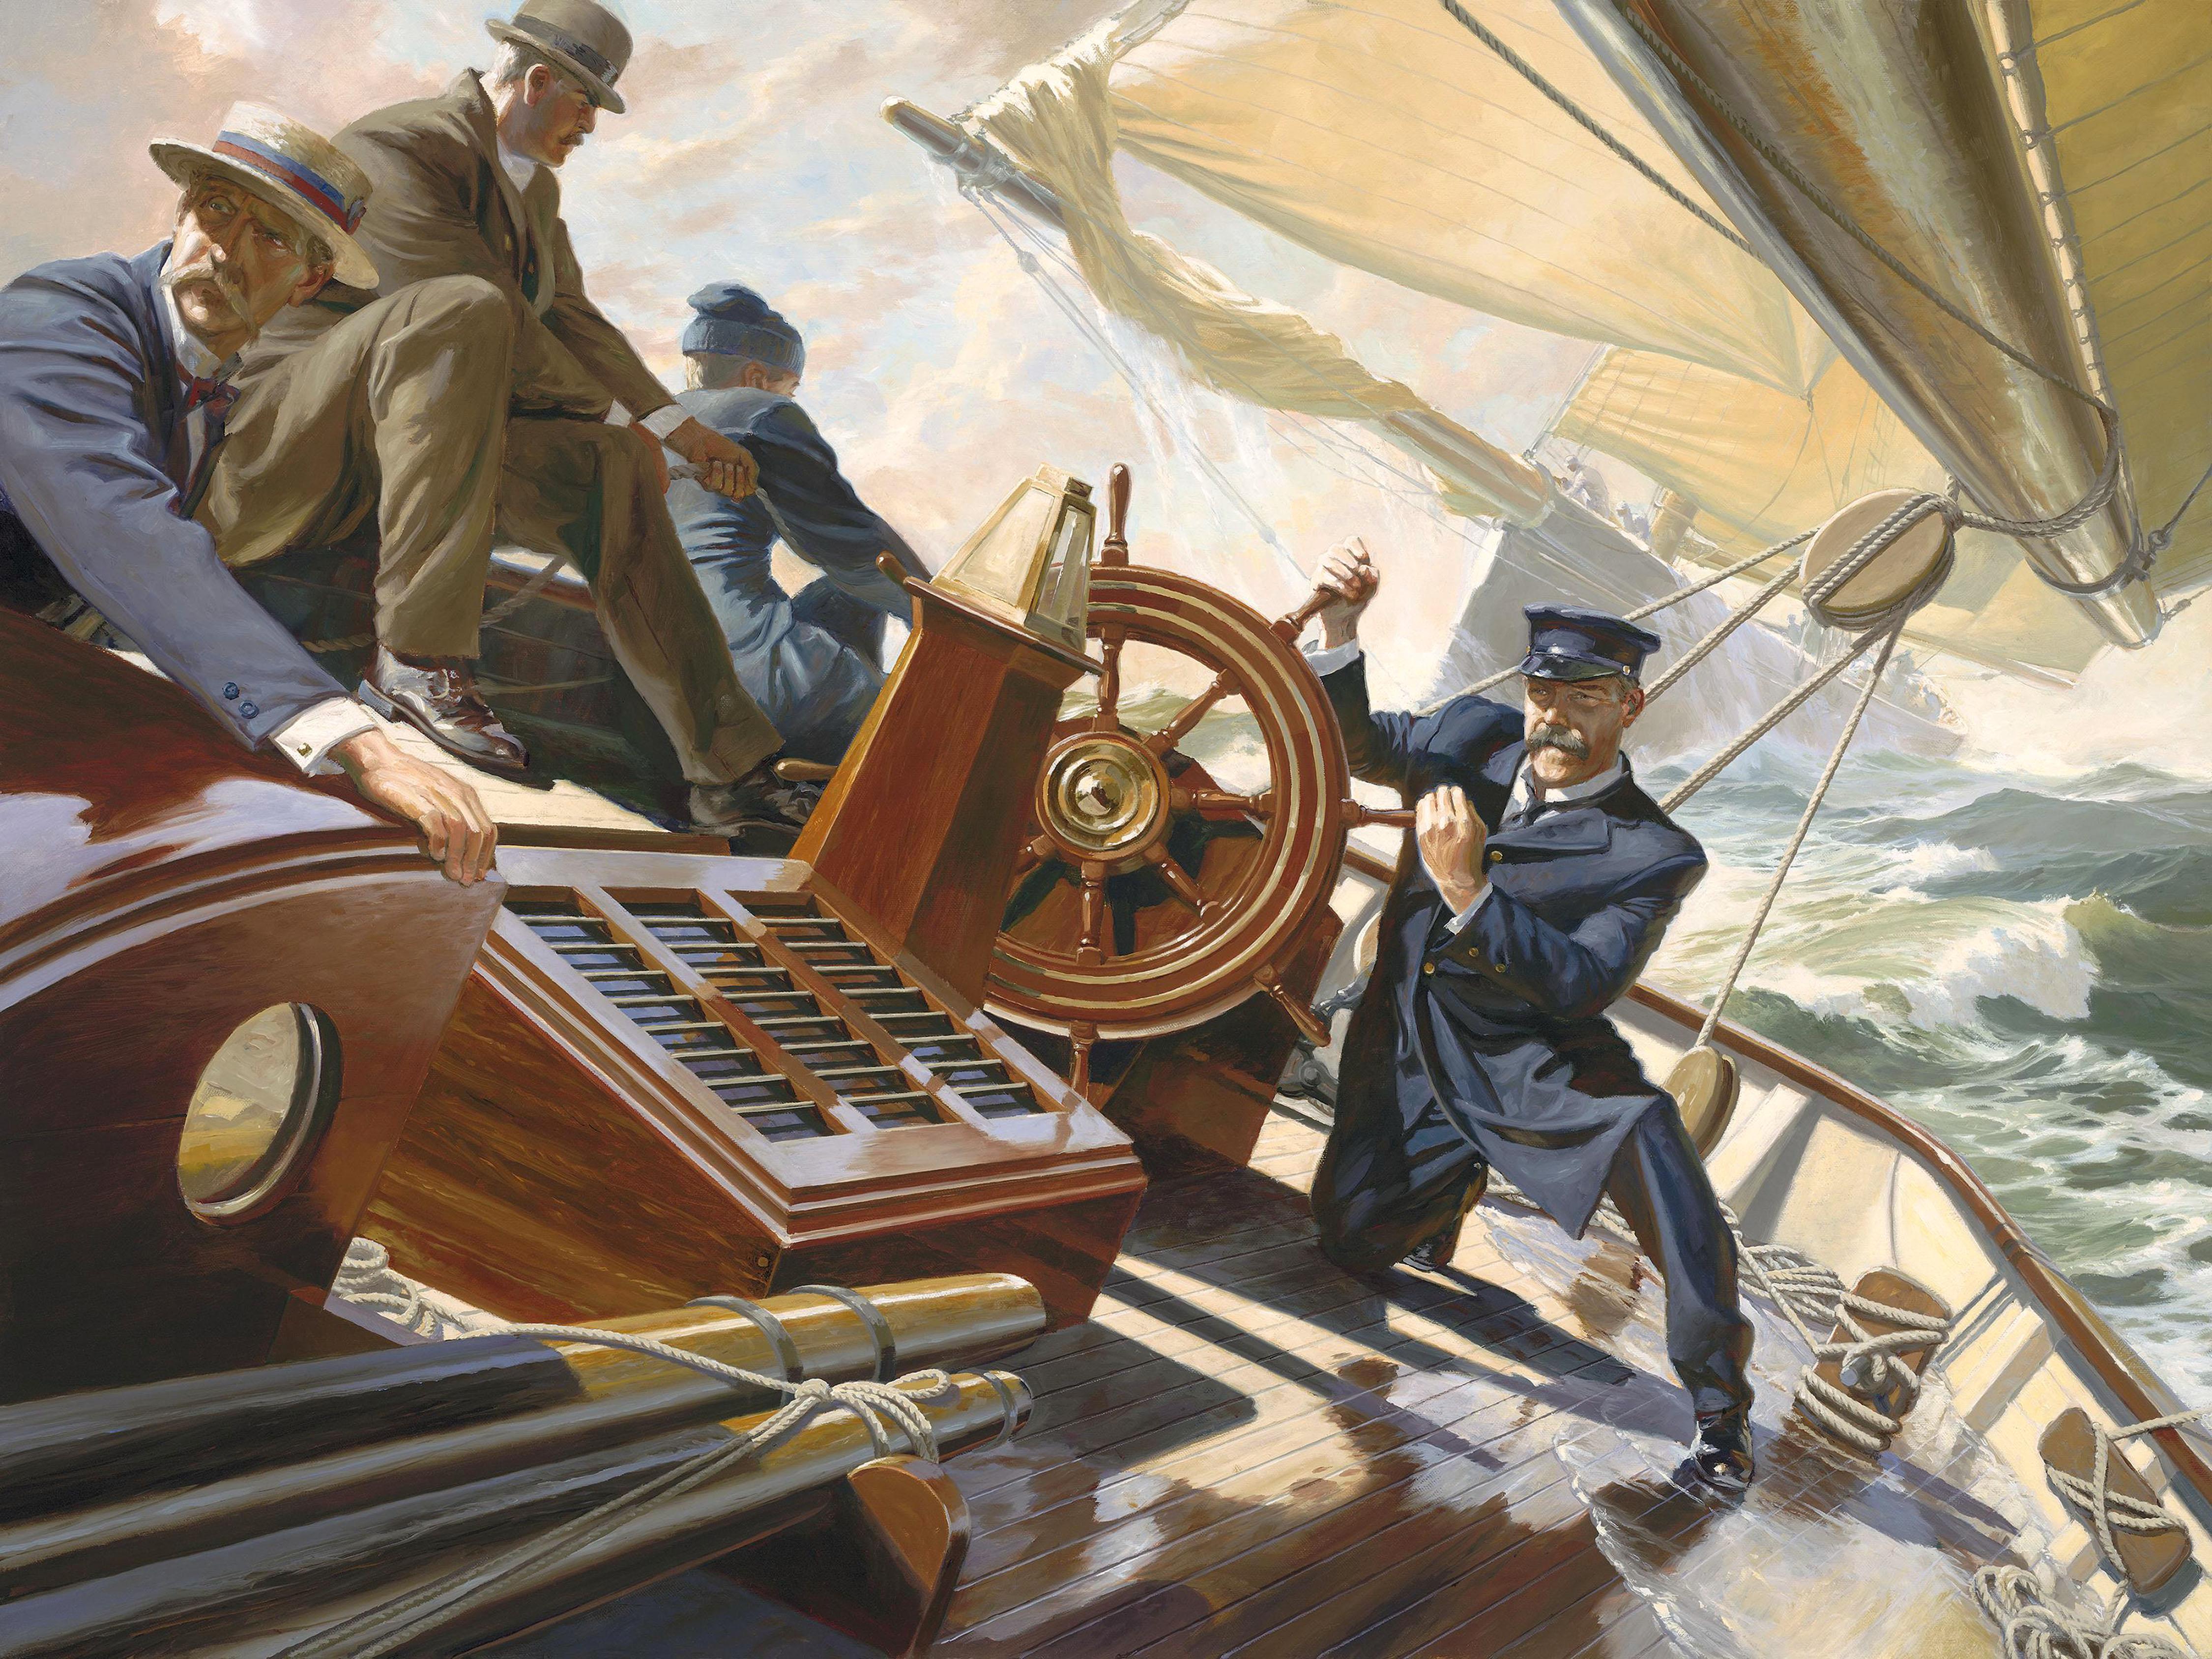 Kramer_Onboard Puritan, 1885_2, 4/17/08, 11:28 AM,  8C, 8982x11142 (0+527), 150%, Custom,  1/60 s, R61.2, G59.7, B82.8